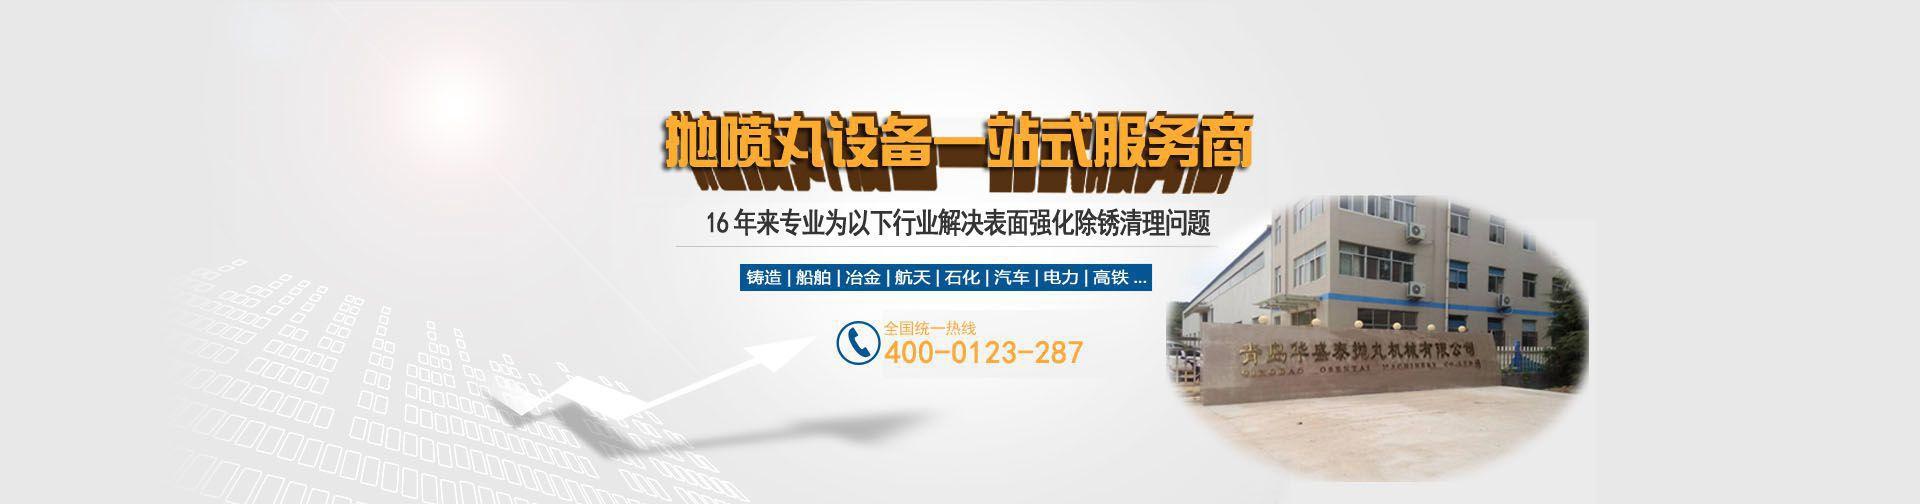 Q3710吊钩式抛丸机_价格80000.00元